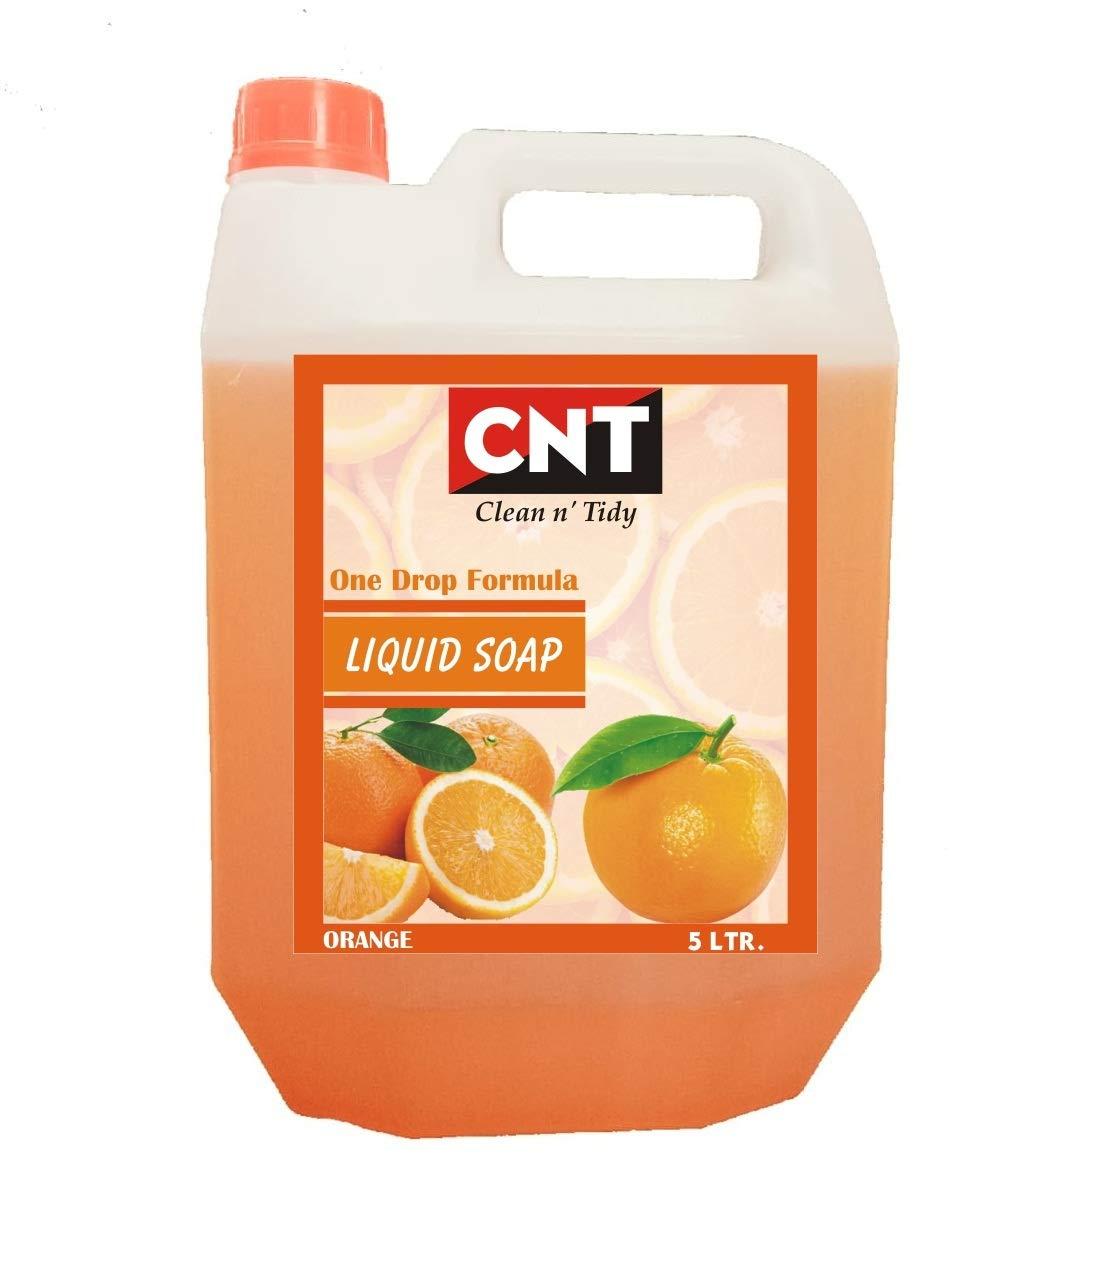 CNT One Drop Formula Fast action Liquid Soap Orange Flavor 5 Liter